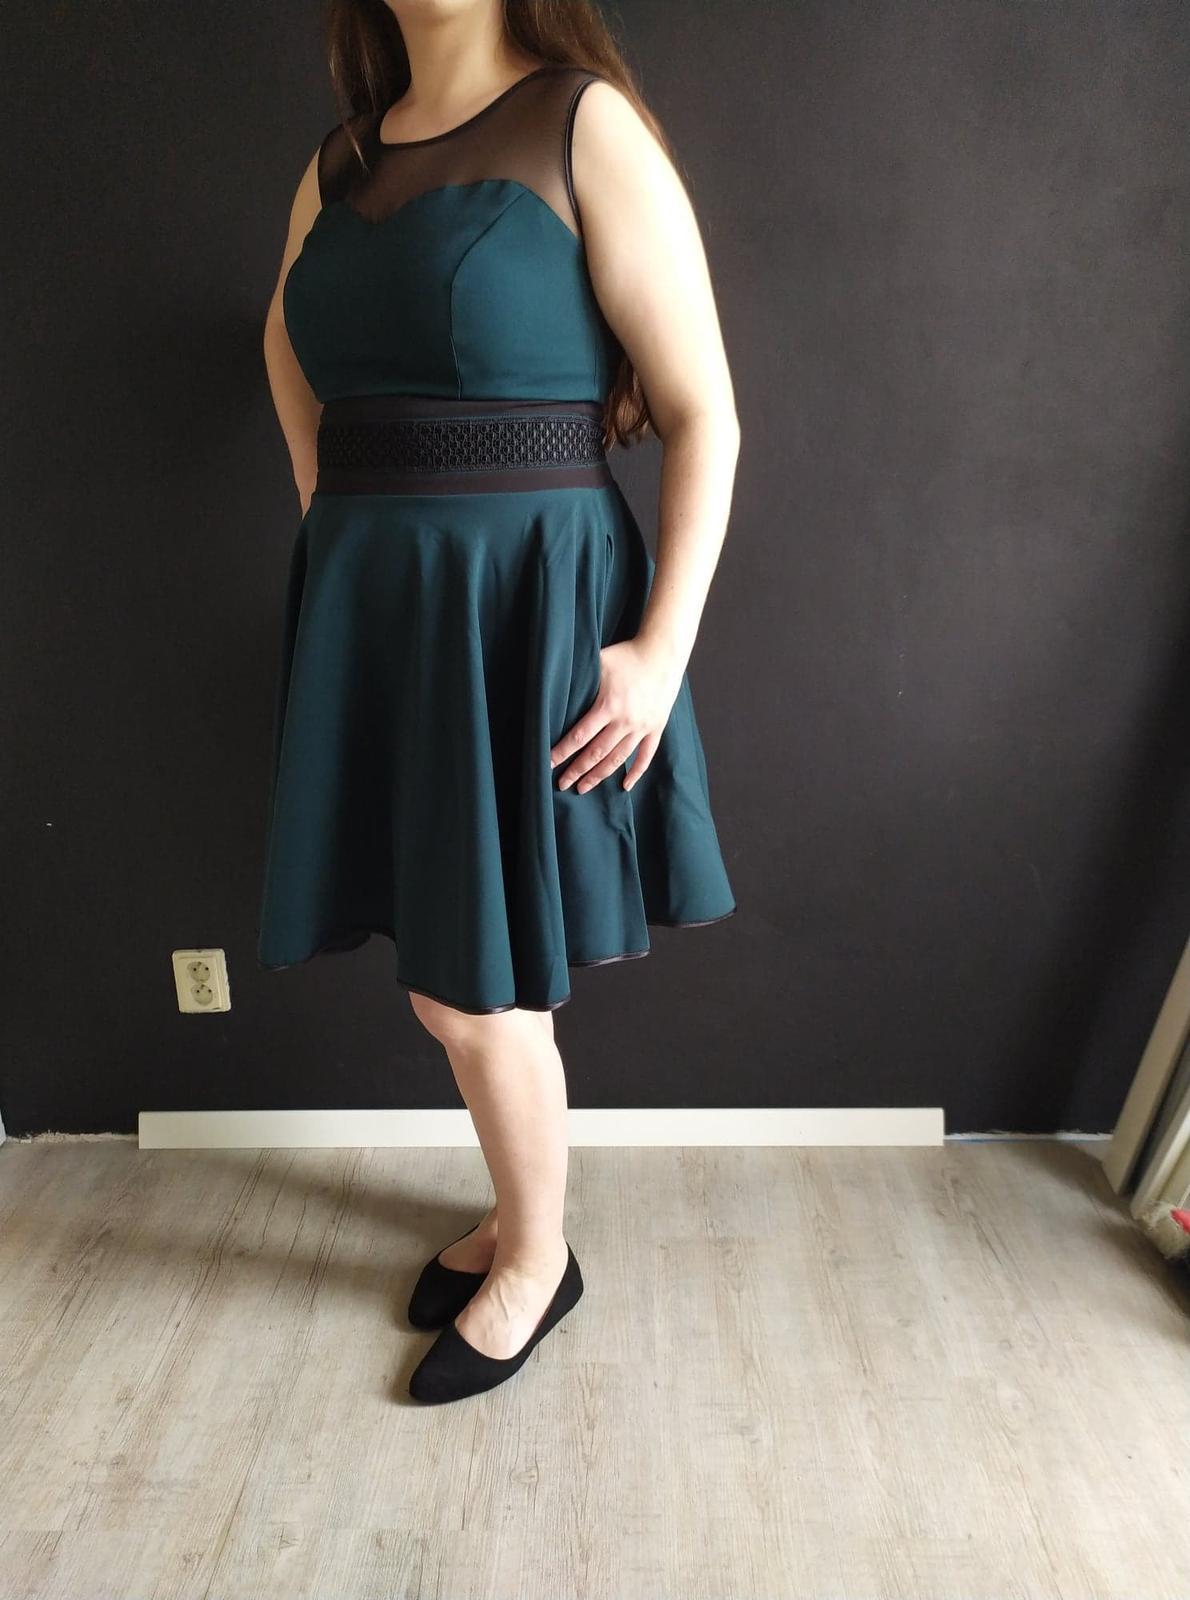 Dámske krátke šaty RICA tmavo zelené veľ. XL - Obrázok č. 1